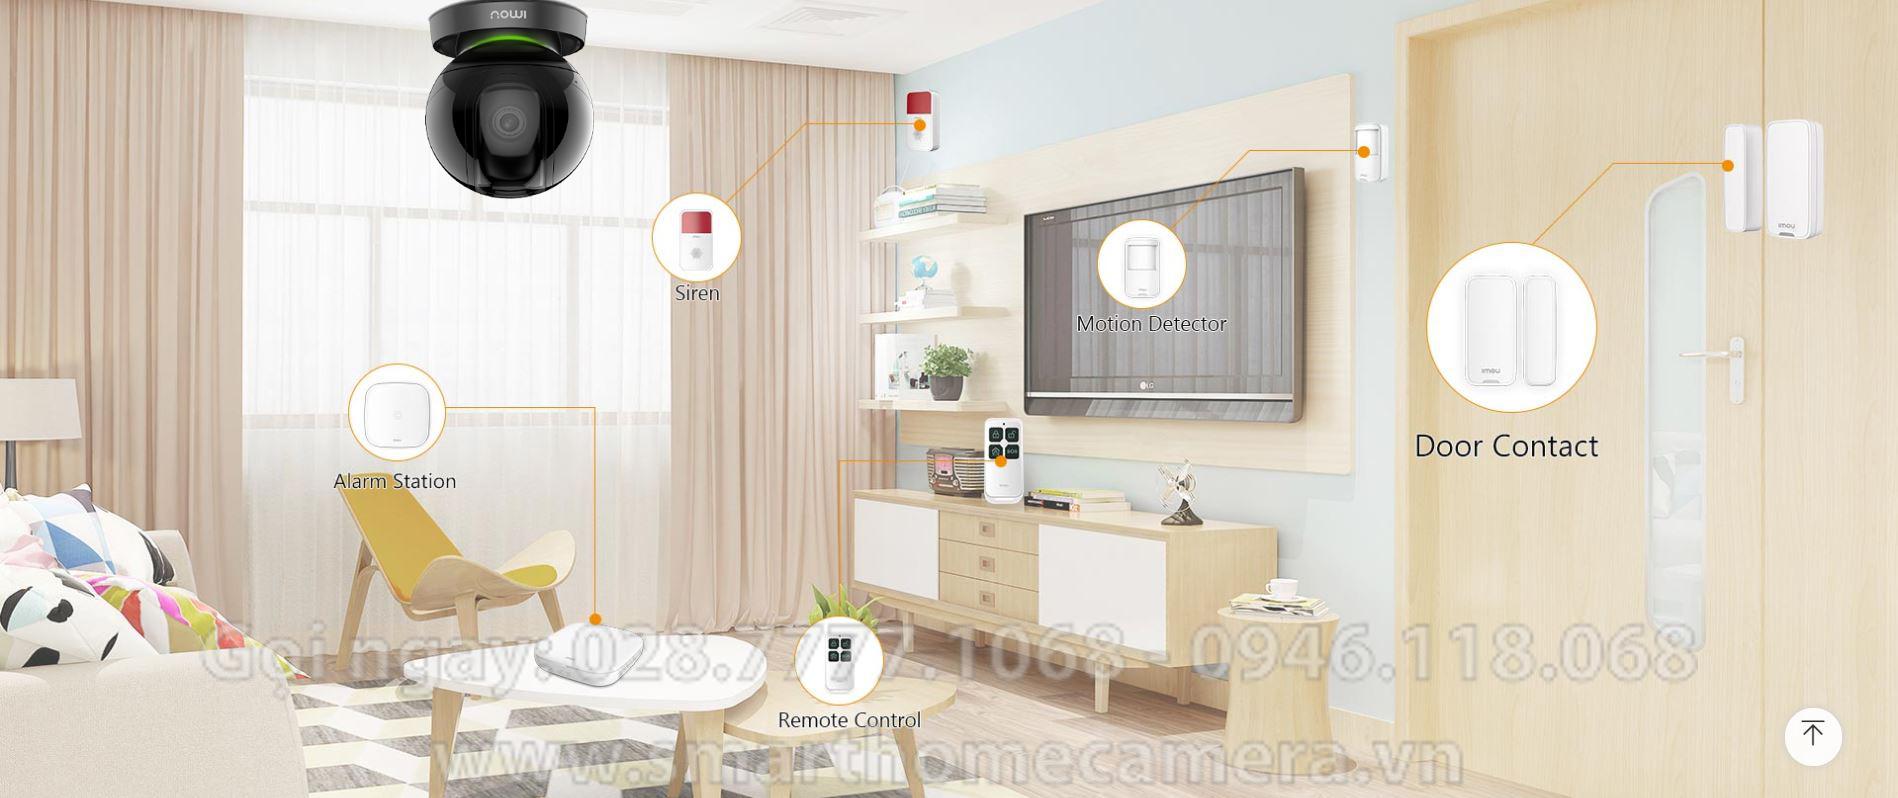 Camera Wifi IMOU Ranger IQ A26HIP 2.0Mp 1080P FullHD